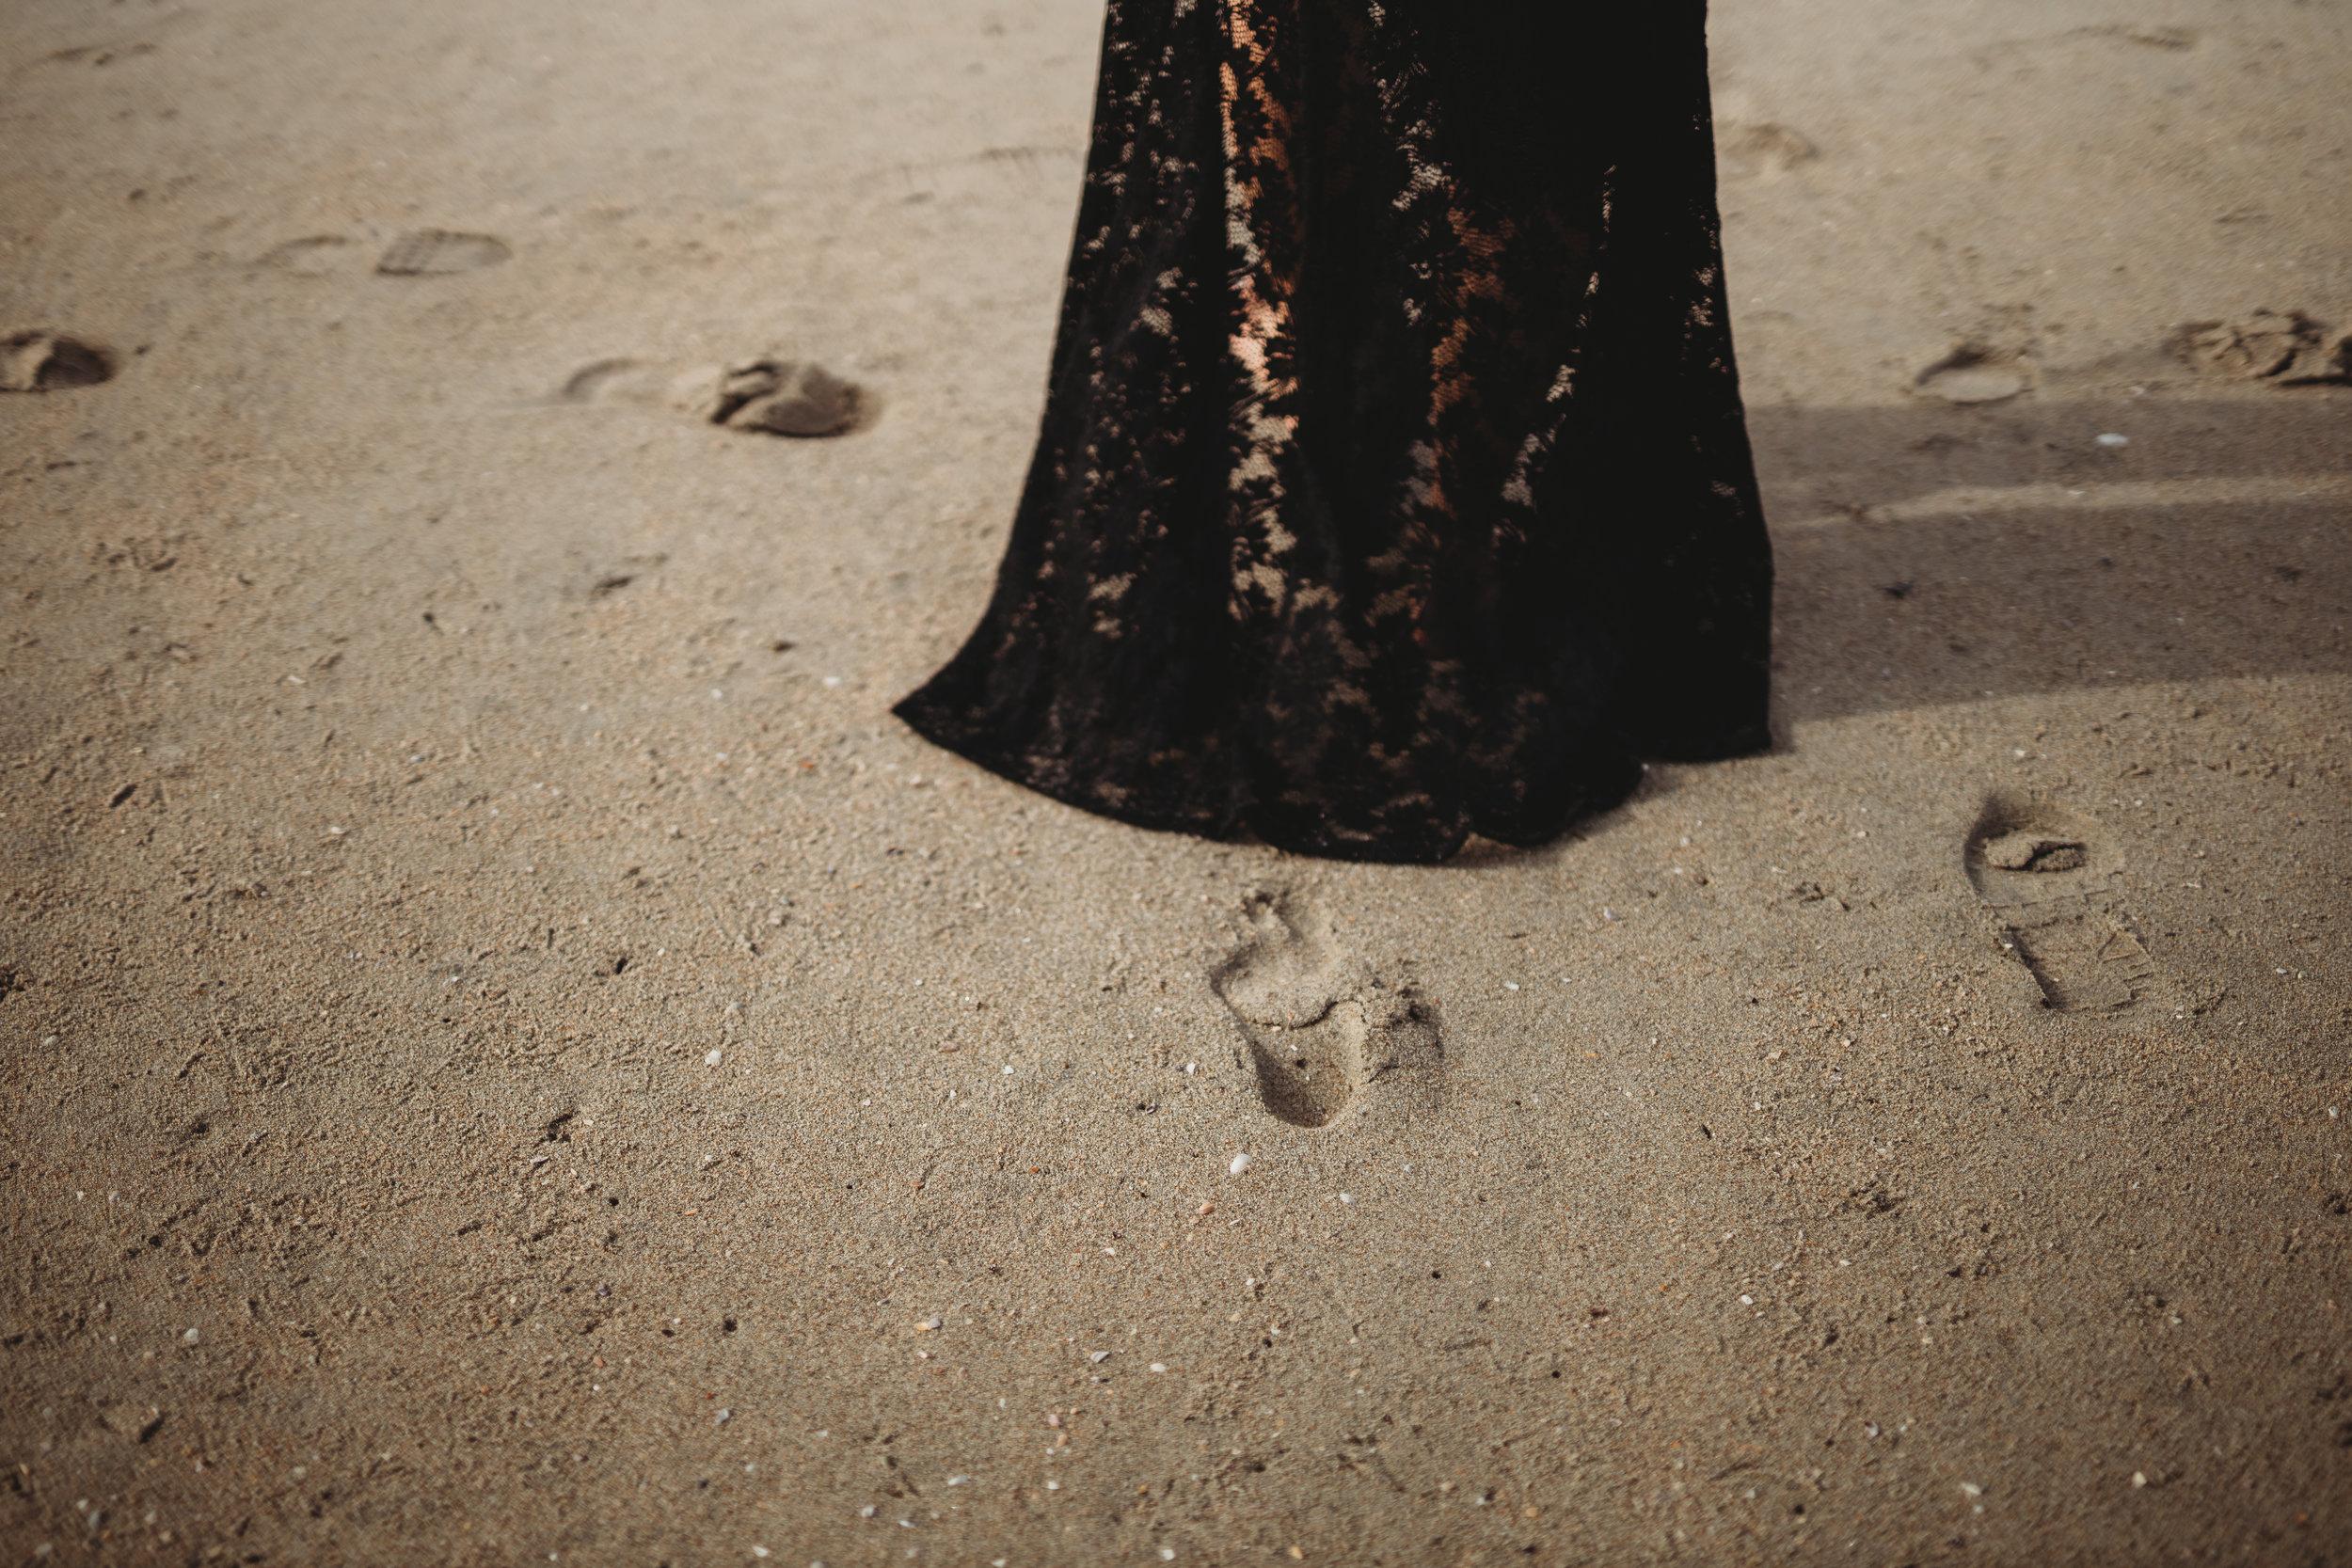 bridal-elopement-engagement-wedding-love-little-rock-arkansas-photographer-erin-venable-photography-bride-groom-palm-springs-california-dessert